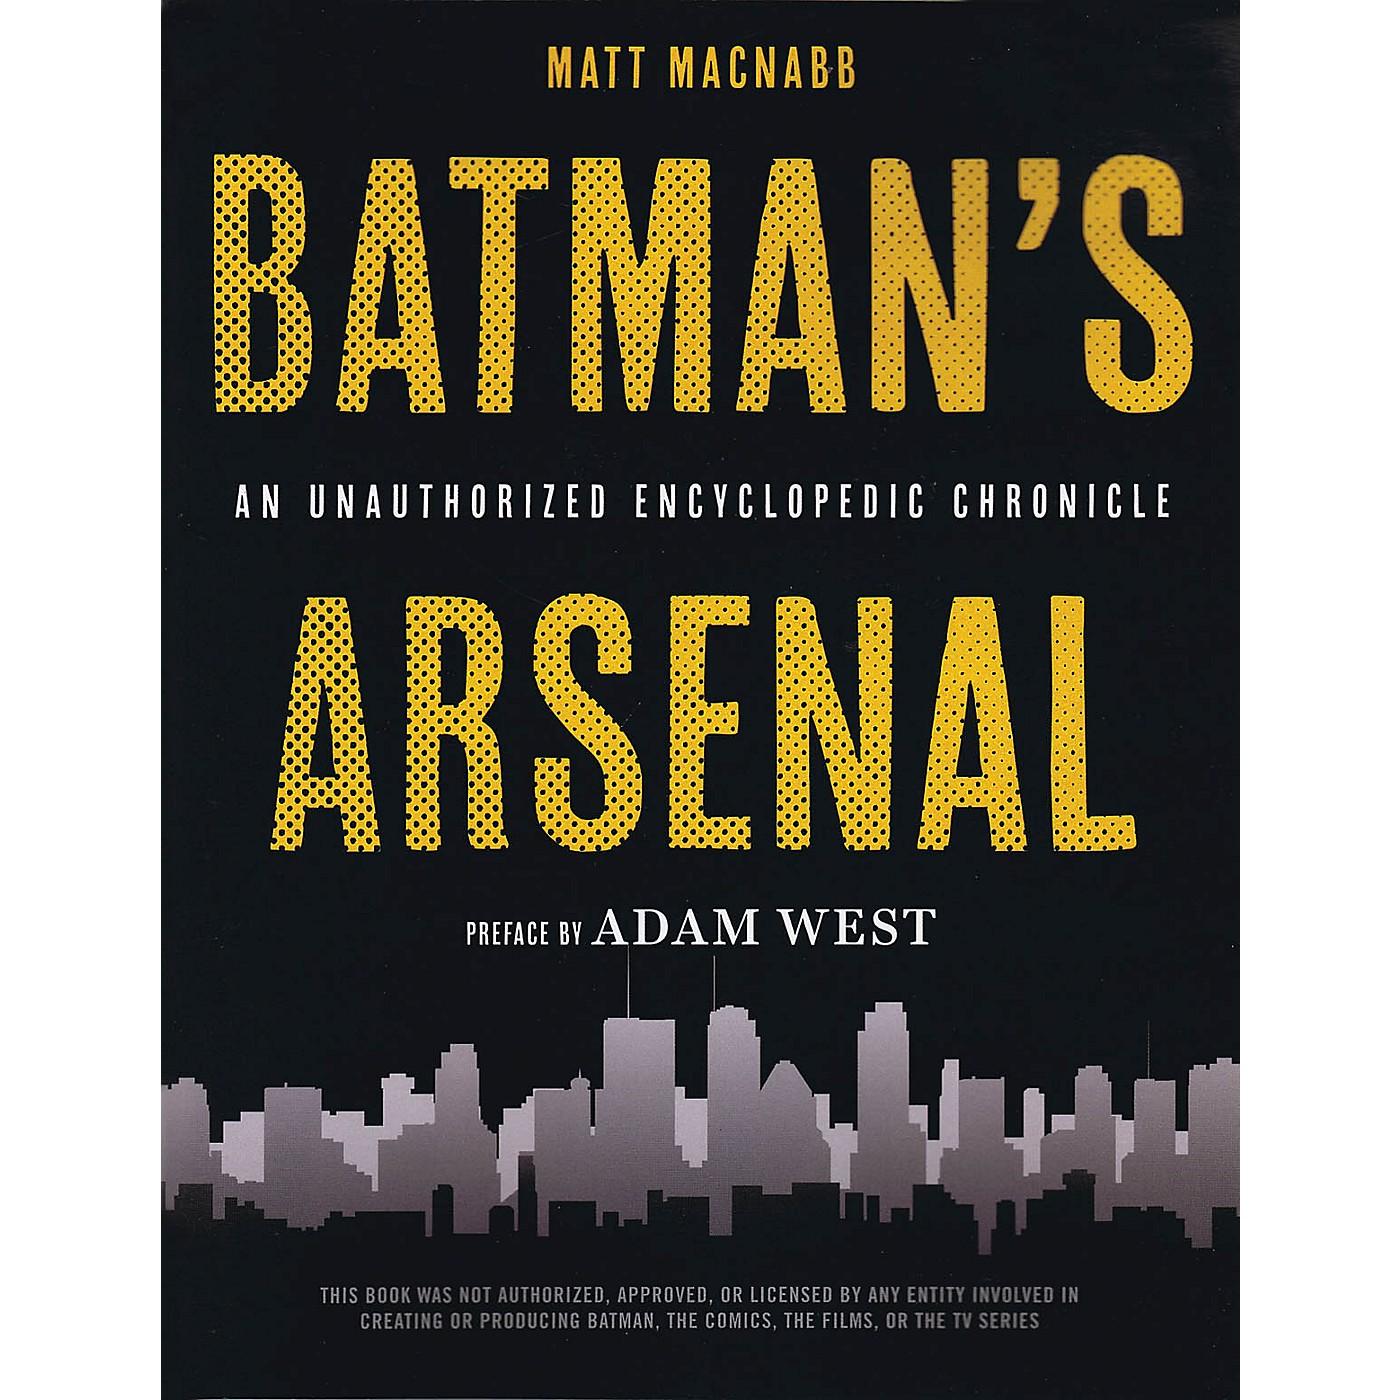 Opus Batman's Arsenal (An Unauthorized Encyclopedic Chronicle) Book Series Softcover Written by Matt MacNabb thumbnail